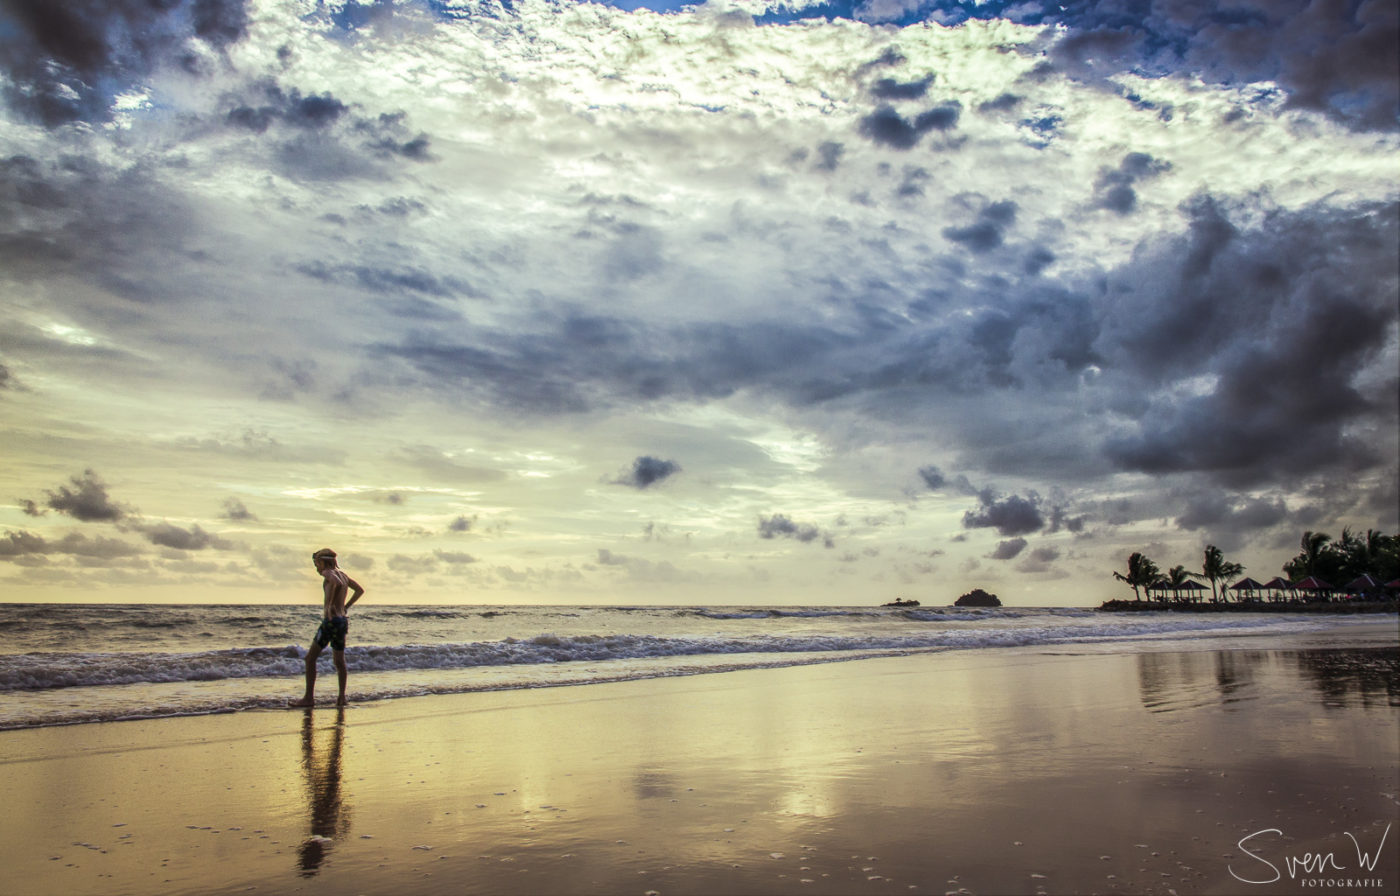 Azië, Kai Bae, Ko Chang, reizen, resort, sea, strand, sunset, Thailand, zonsondergang, sven, muur, reflectie,